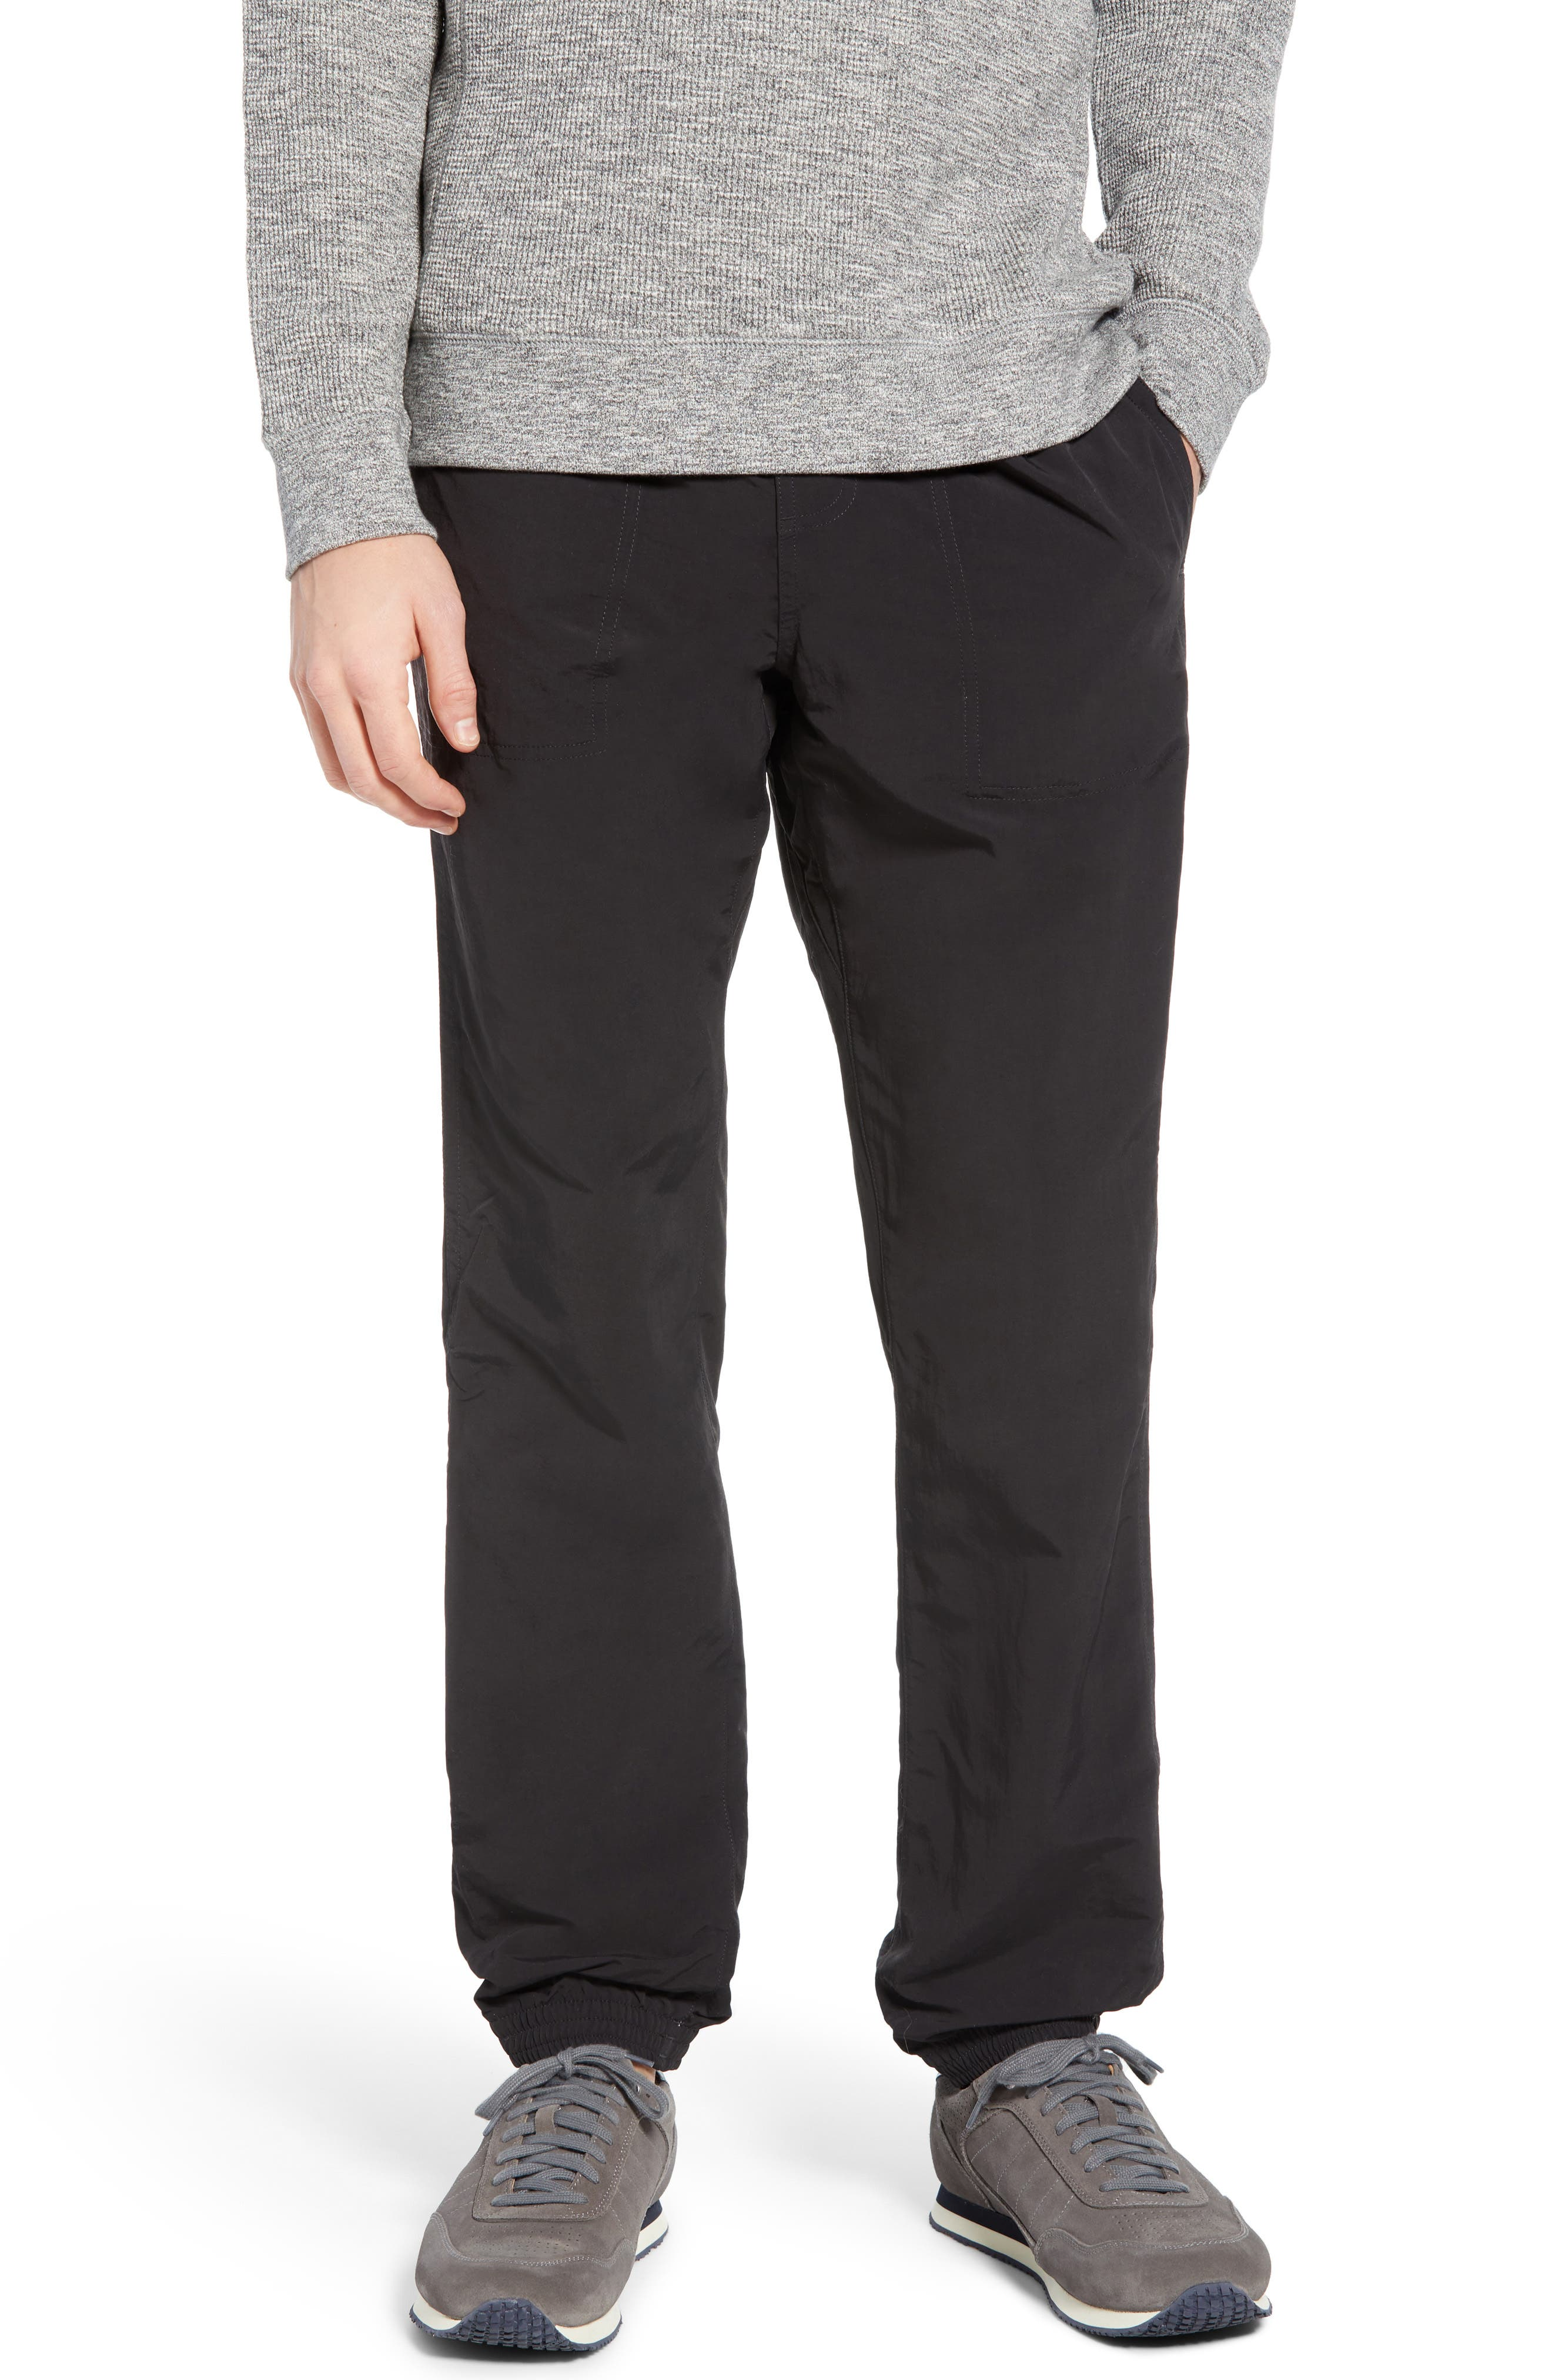 Patagonia Baggies(TM) Slim Fit Pants, Black